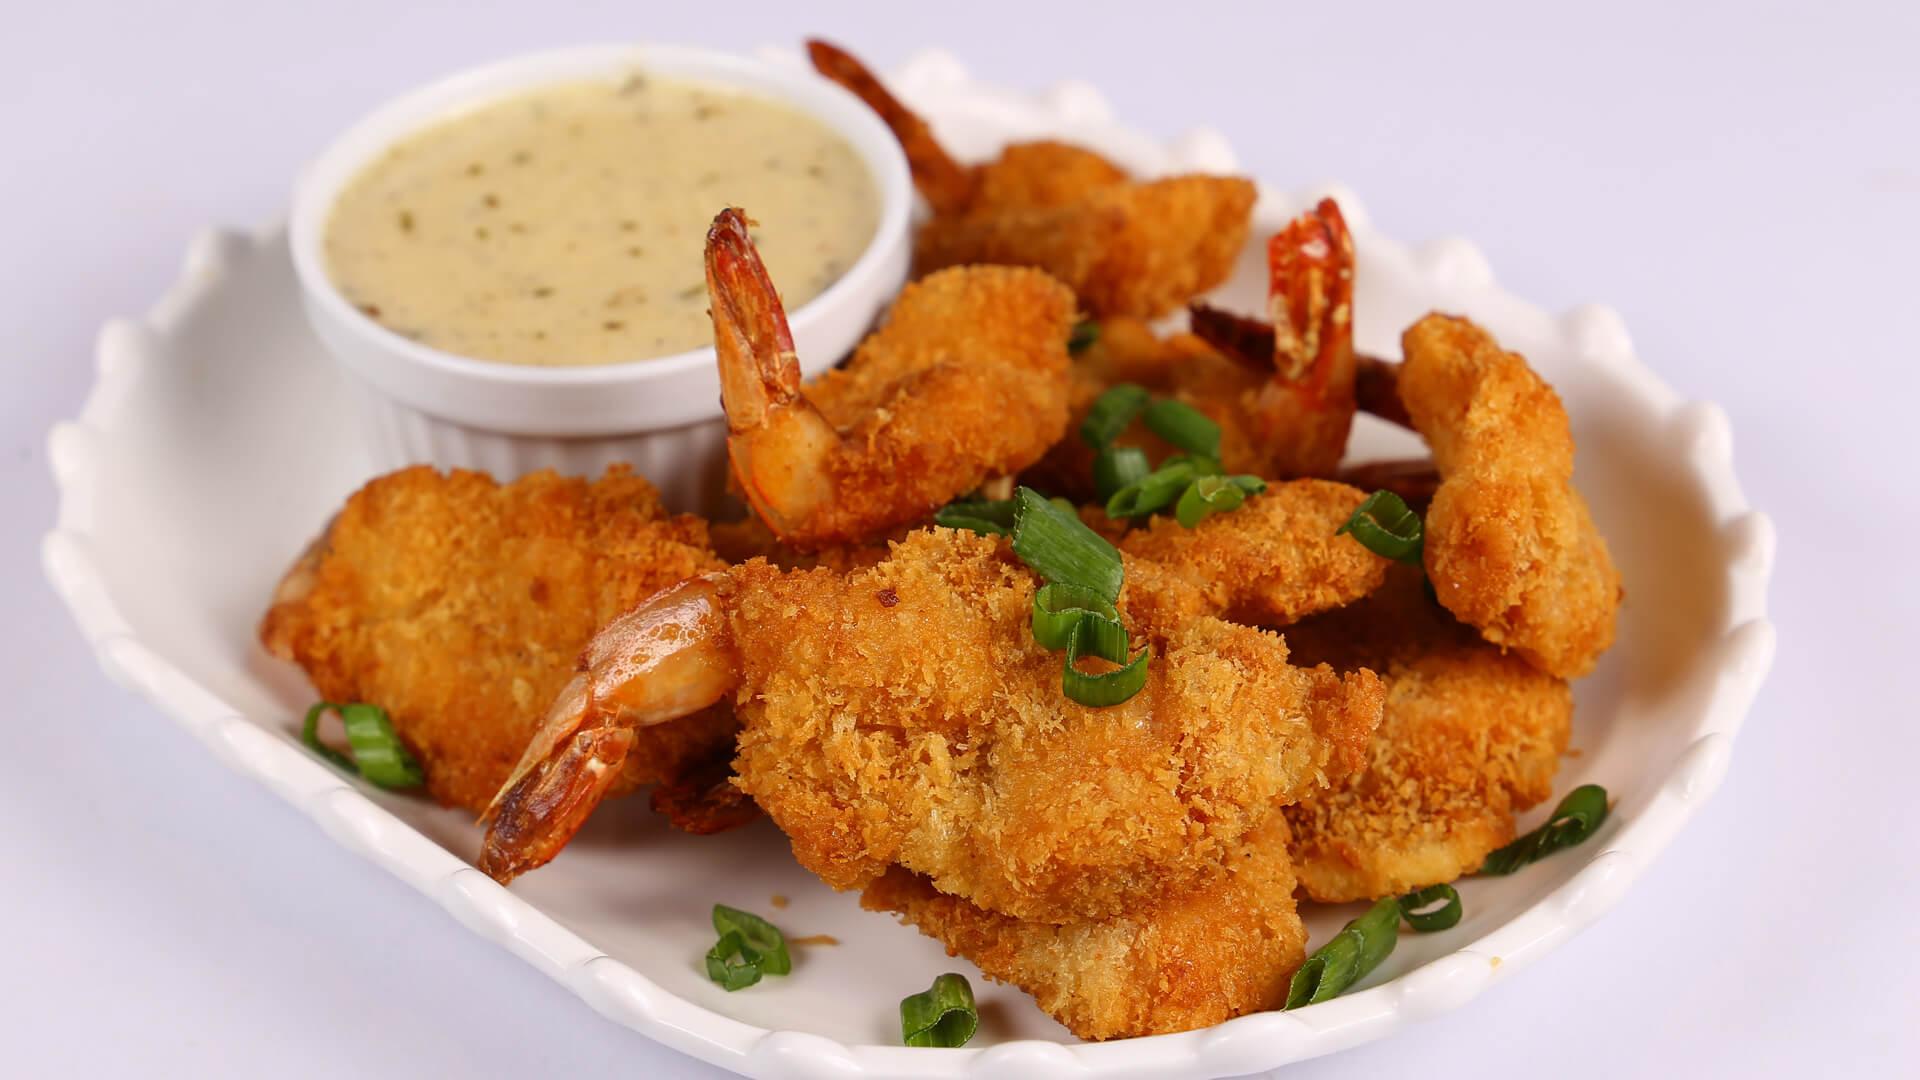 Fried Shrimp with white sauce | Tarka | Chef Rida Aftab